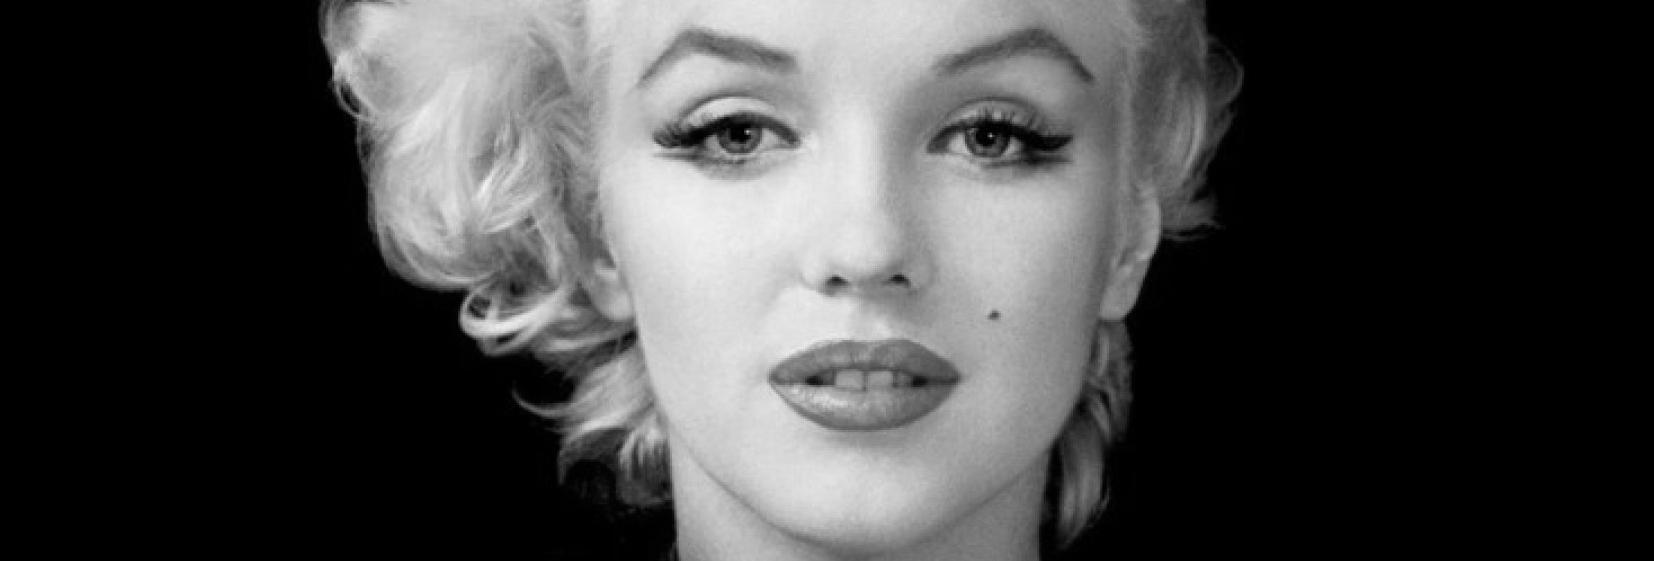 Marilyn_slice